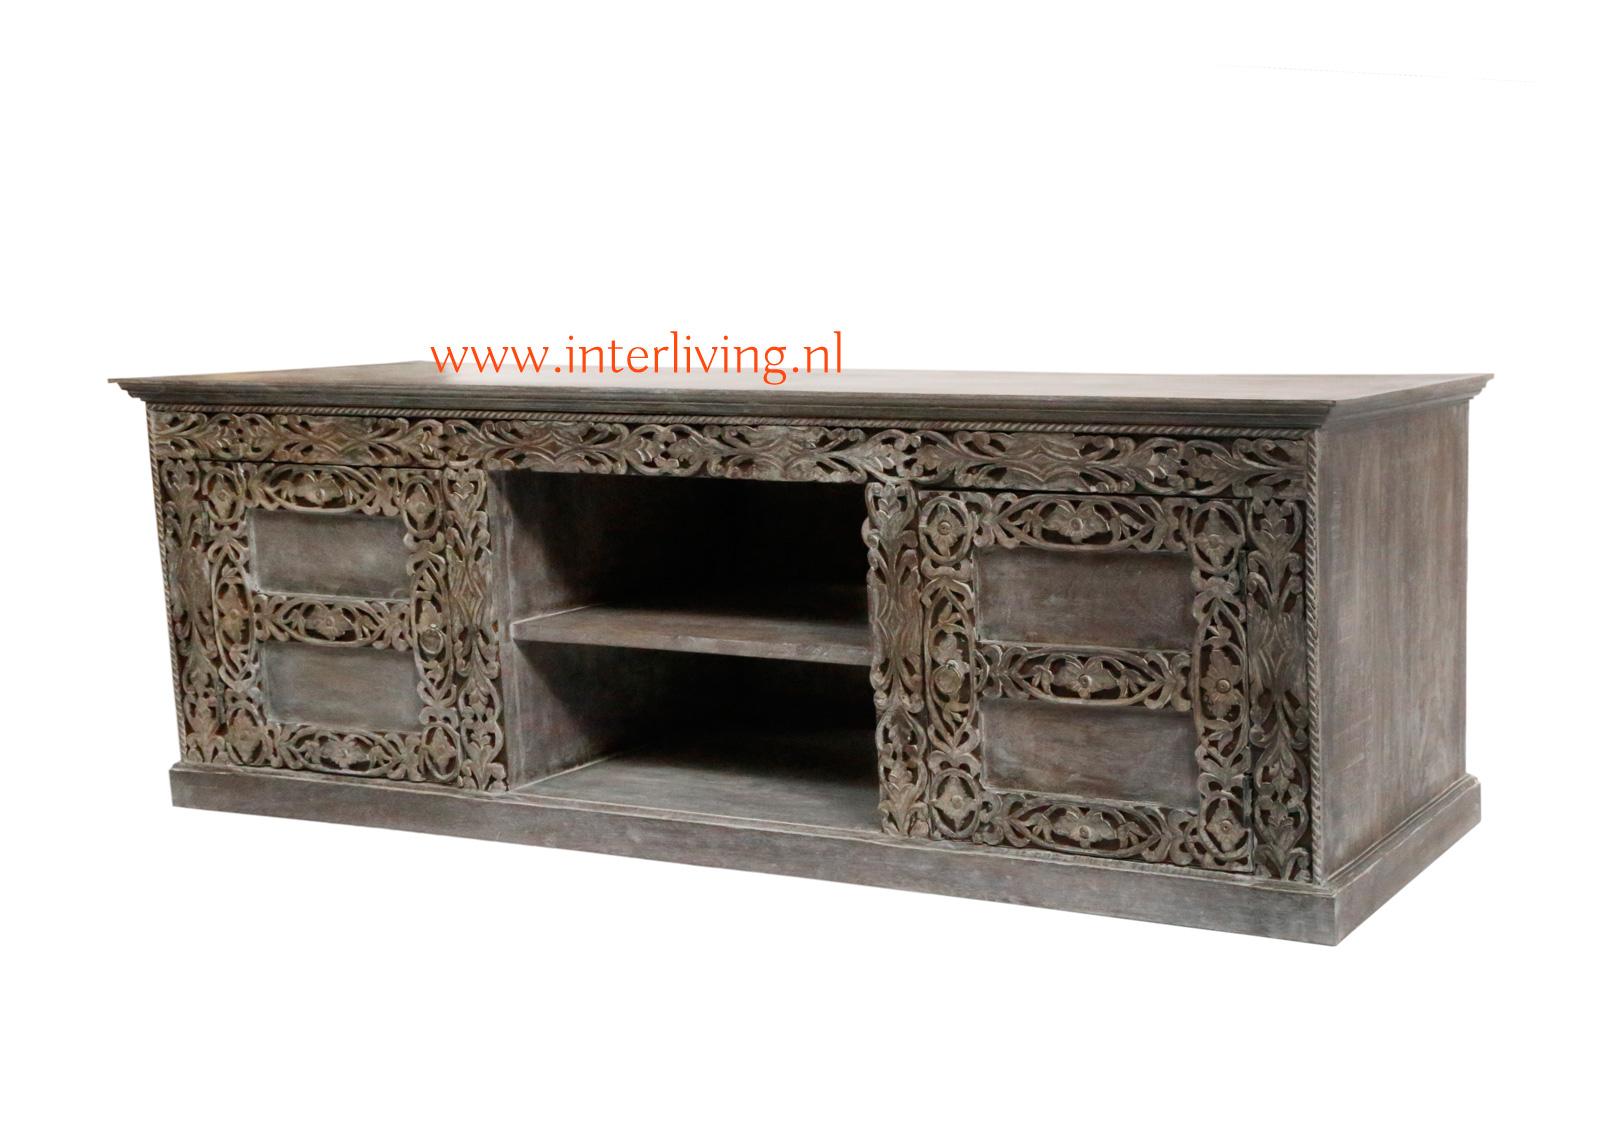 donker mangohout grey washed tv kast - tvdressior of tvmeubel uit India - handgemaakt met houtsnijwerk